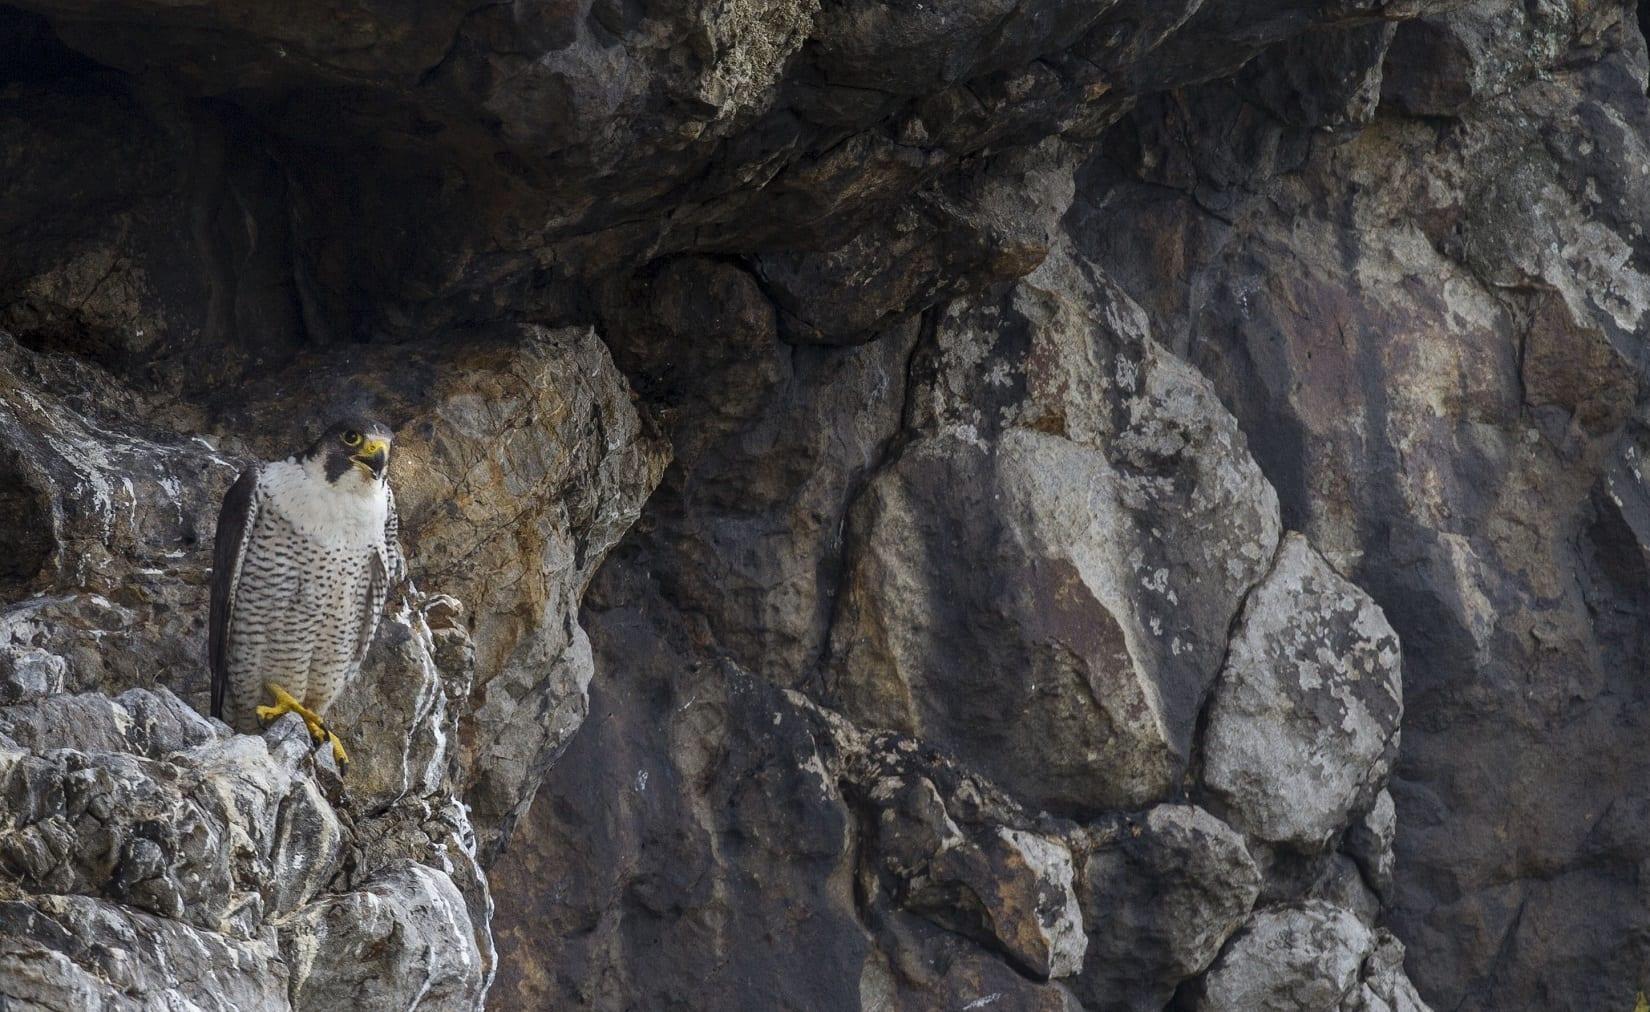 peregrine-falcon-perched-on-cliff